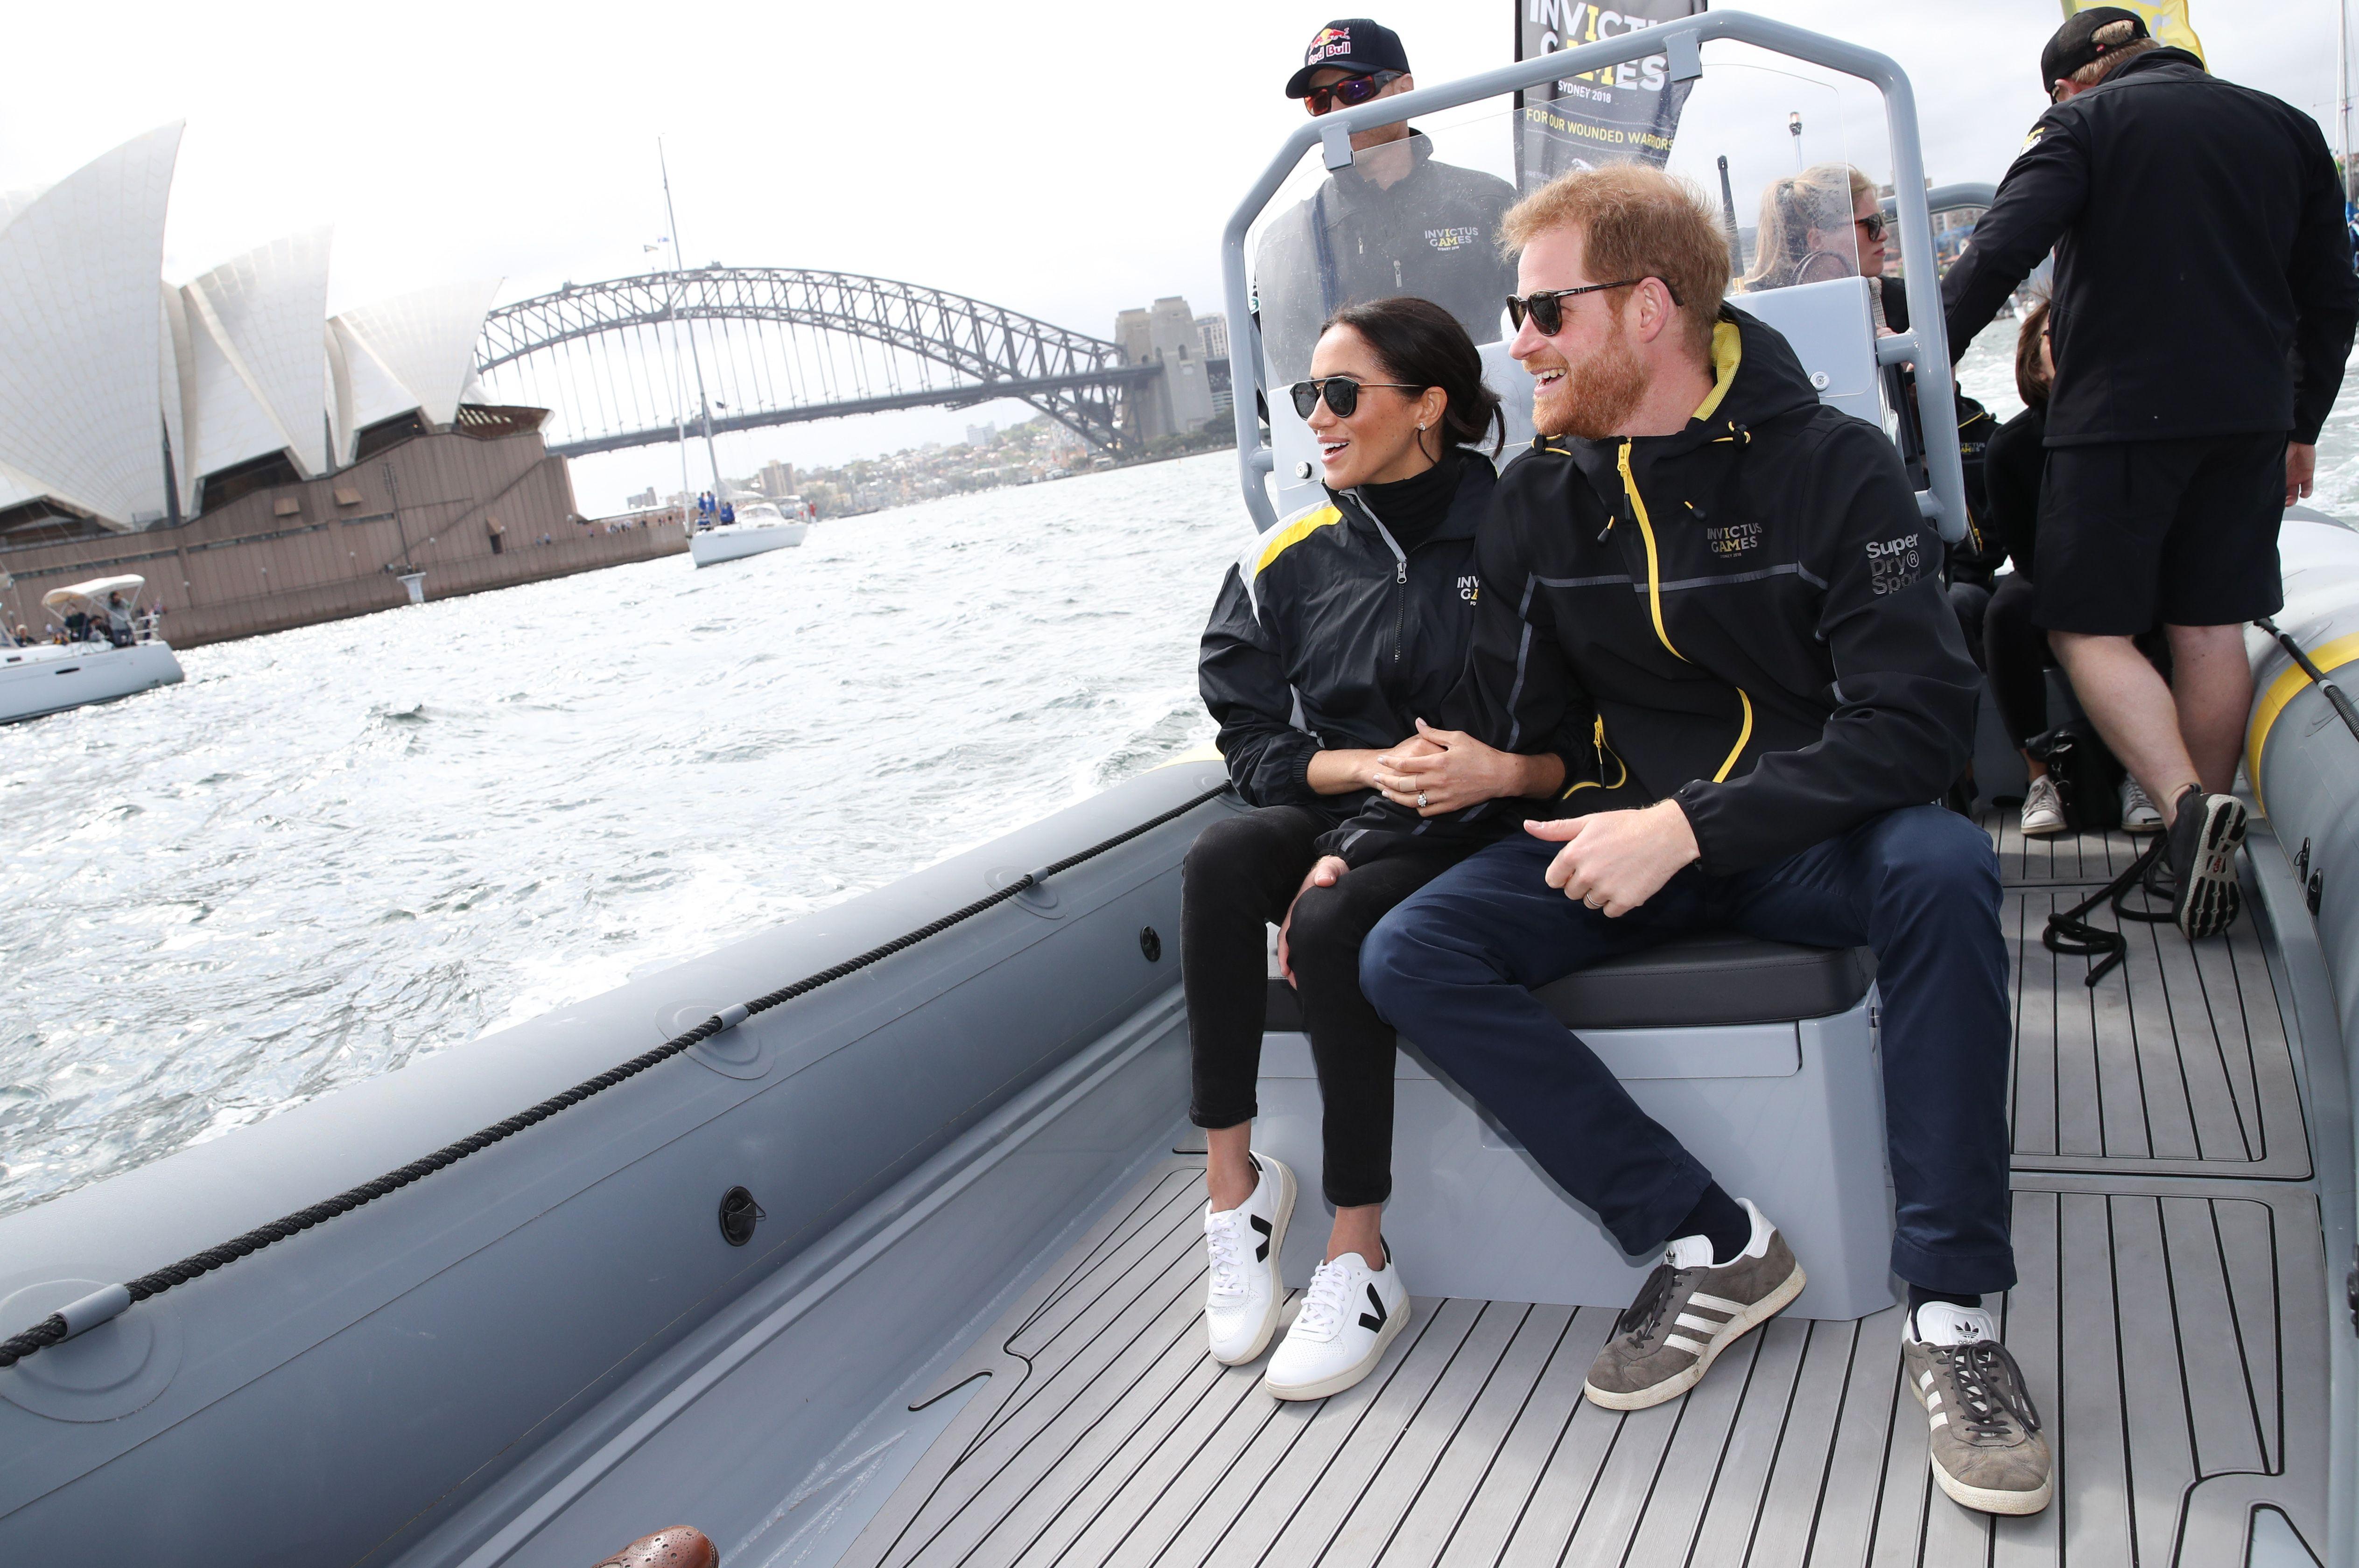 5f7ace2dc Meghan Markle Wears White Veja Esplar Sneakers for Invictus Games in  Sydney, Australia